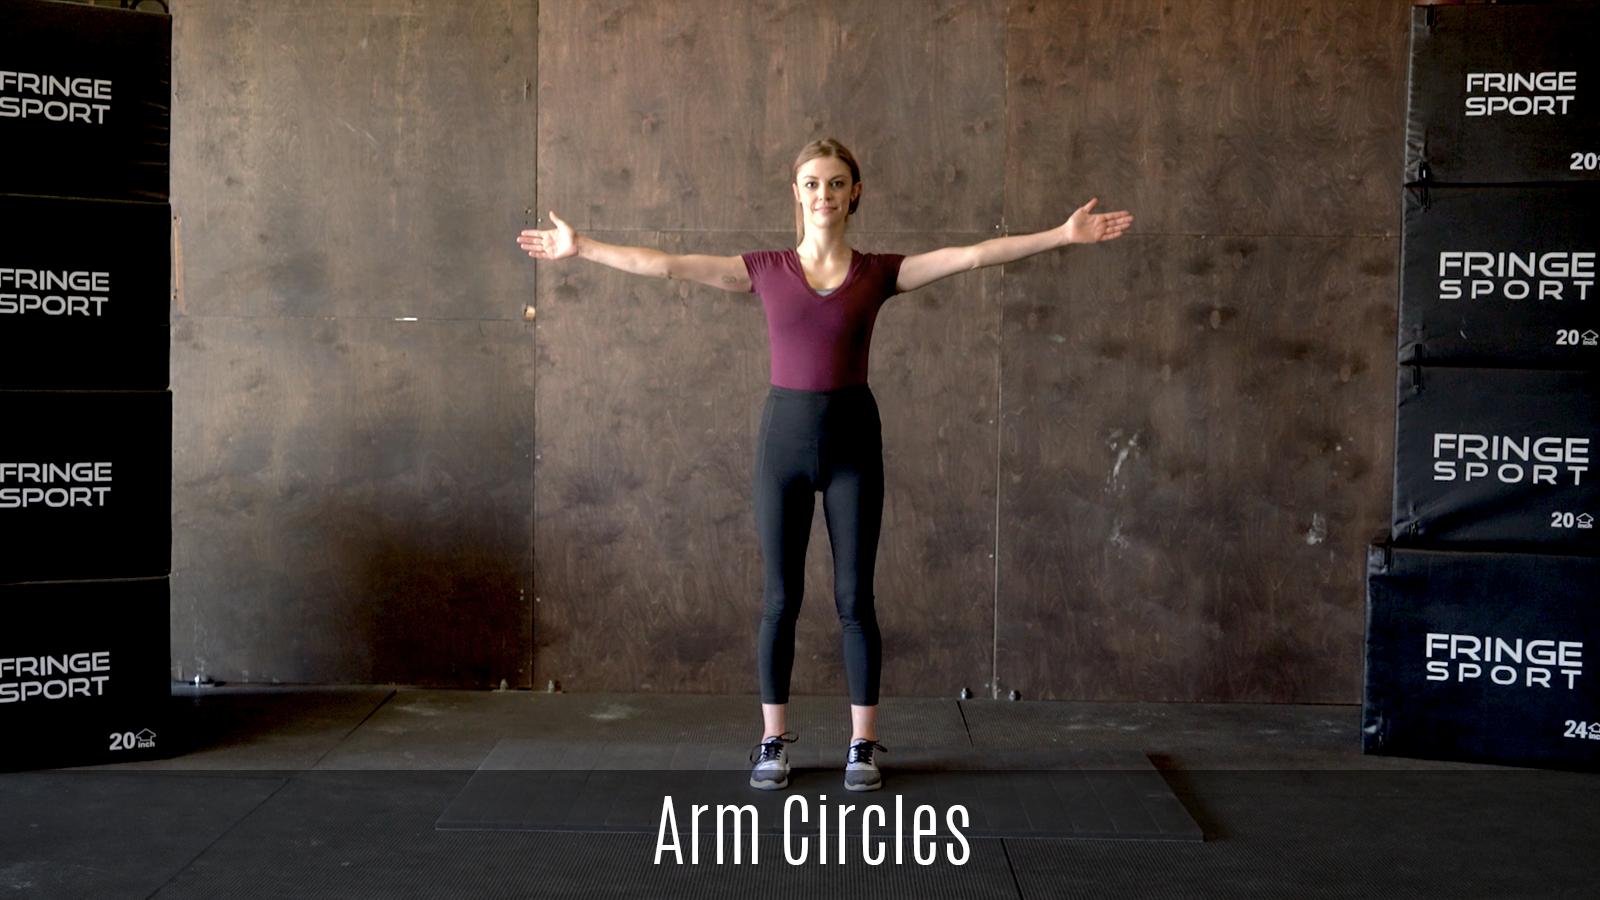 arm circles exercise demo